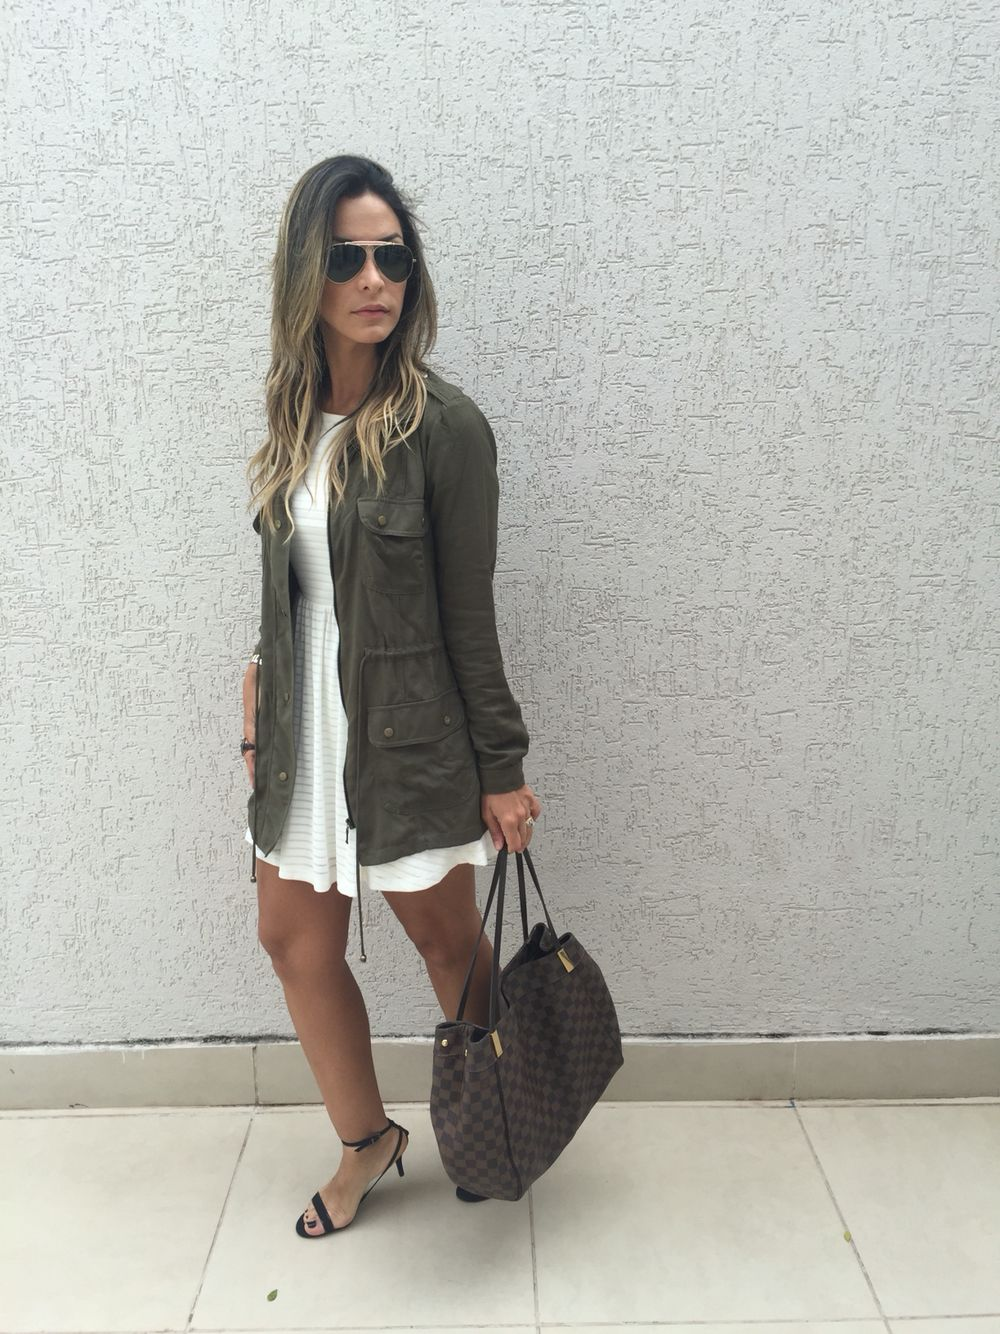 Jaqueta verde militar moda pinterest